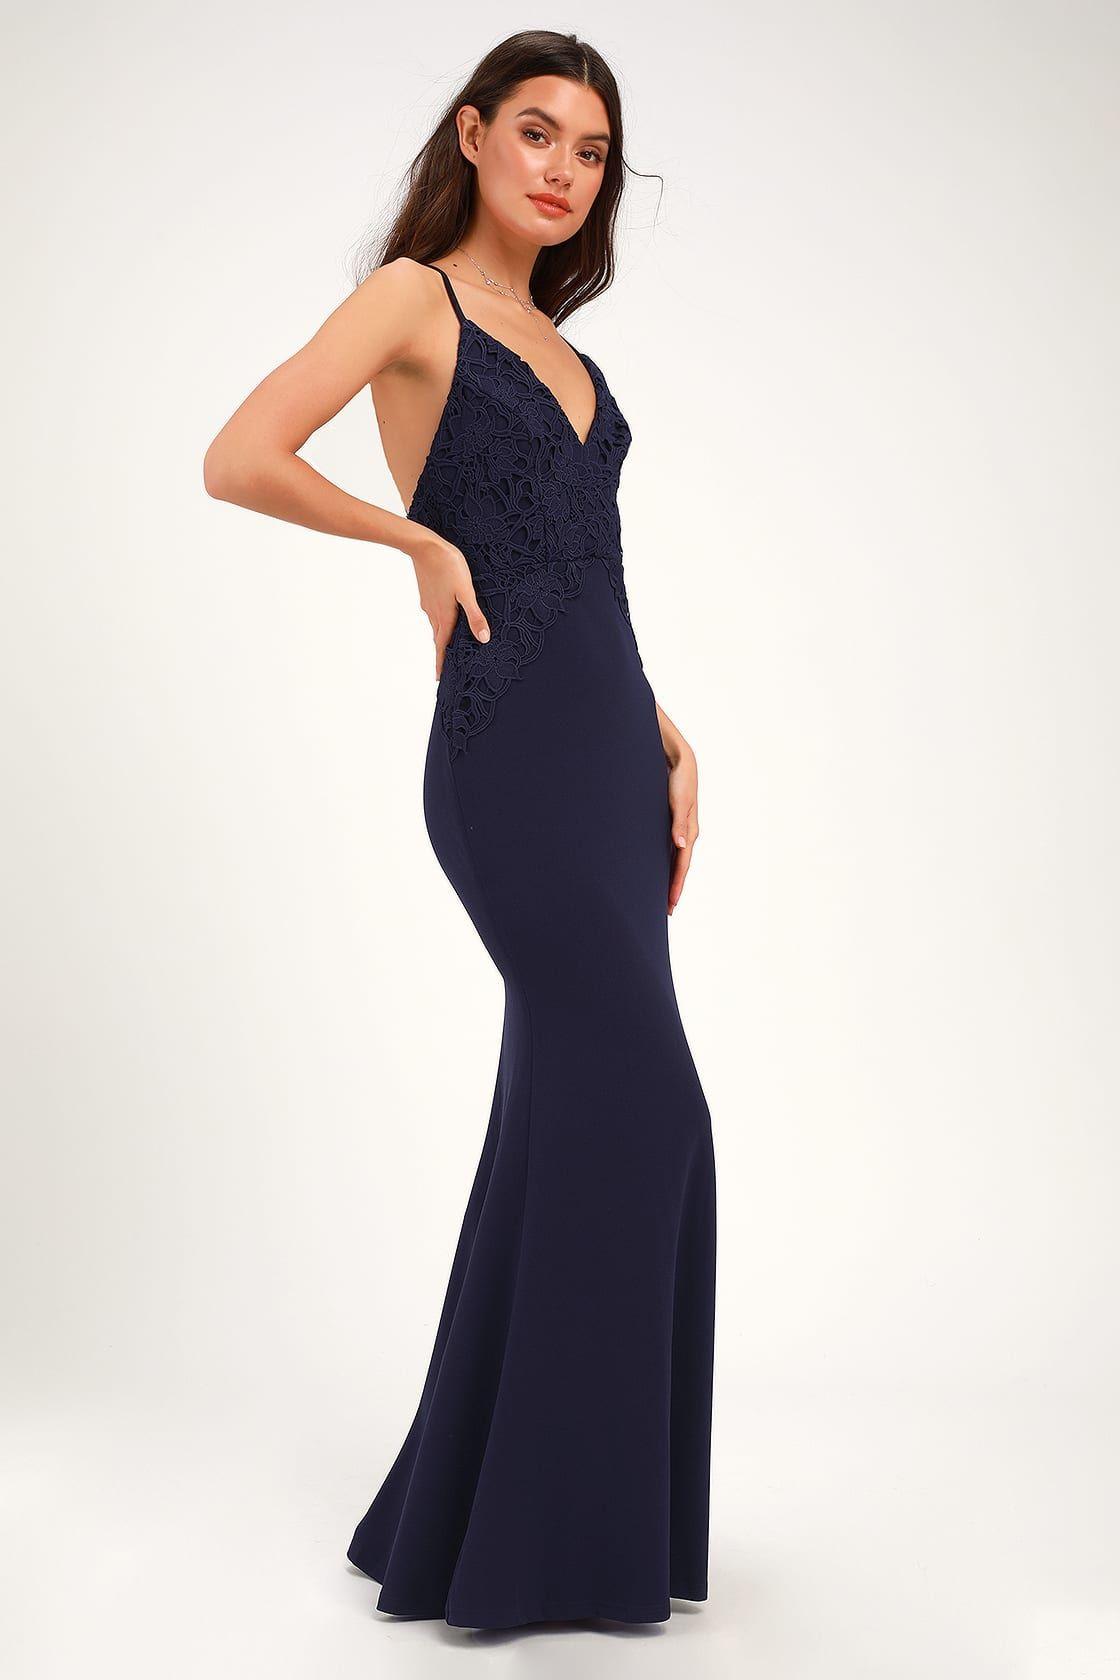 cb78004d829d Katalina Navy Blue Backless Crochet Lace Maxi Dress in 2019   Prom ...